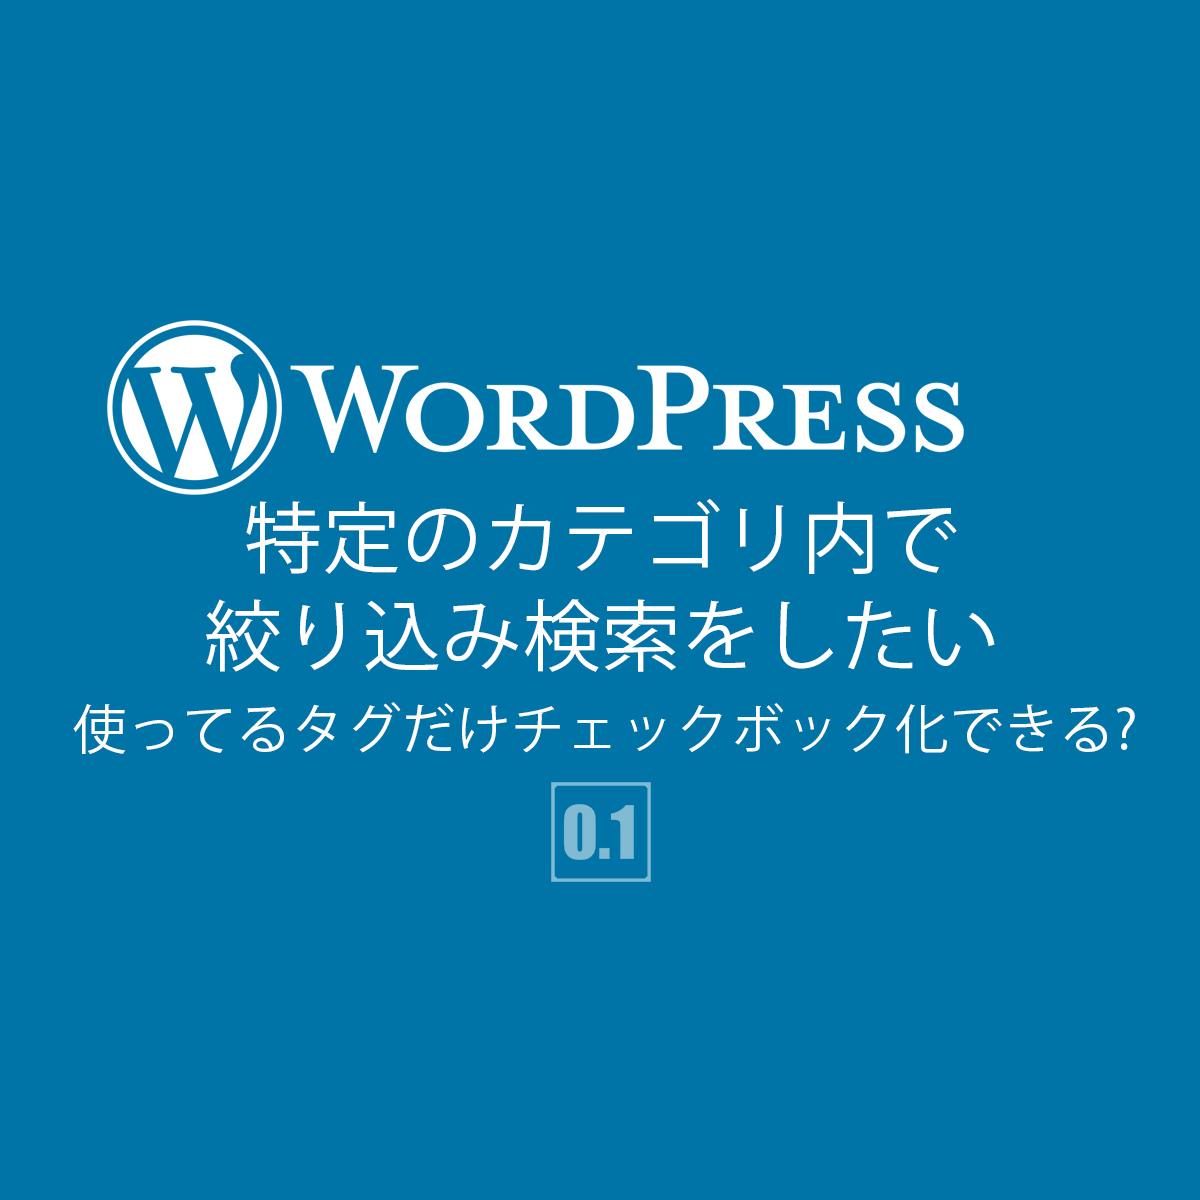 【WordPress】特定のカテゴリ内で絞り込み検索をしたい